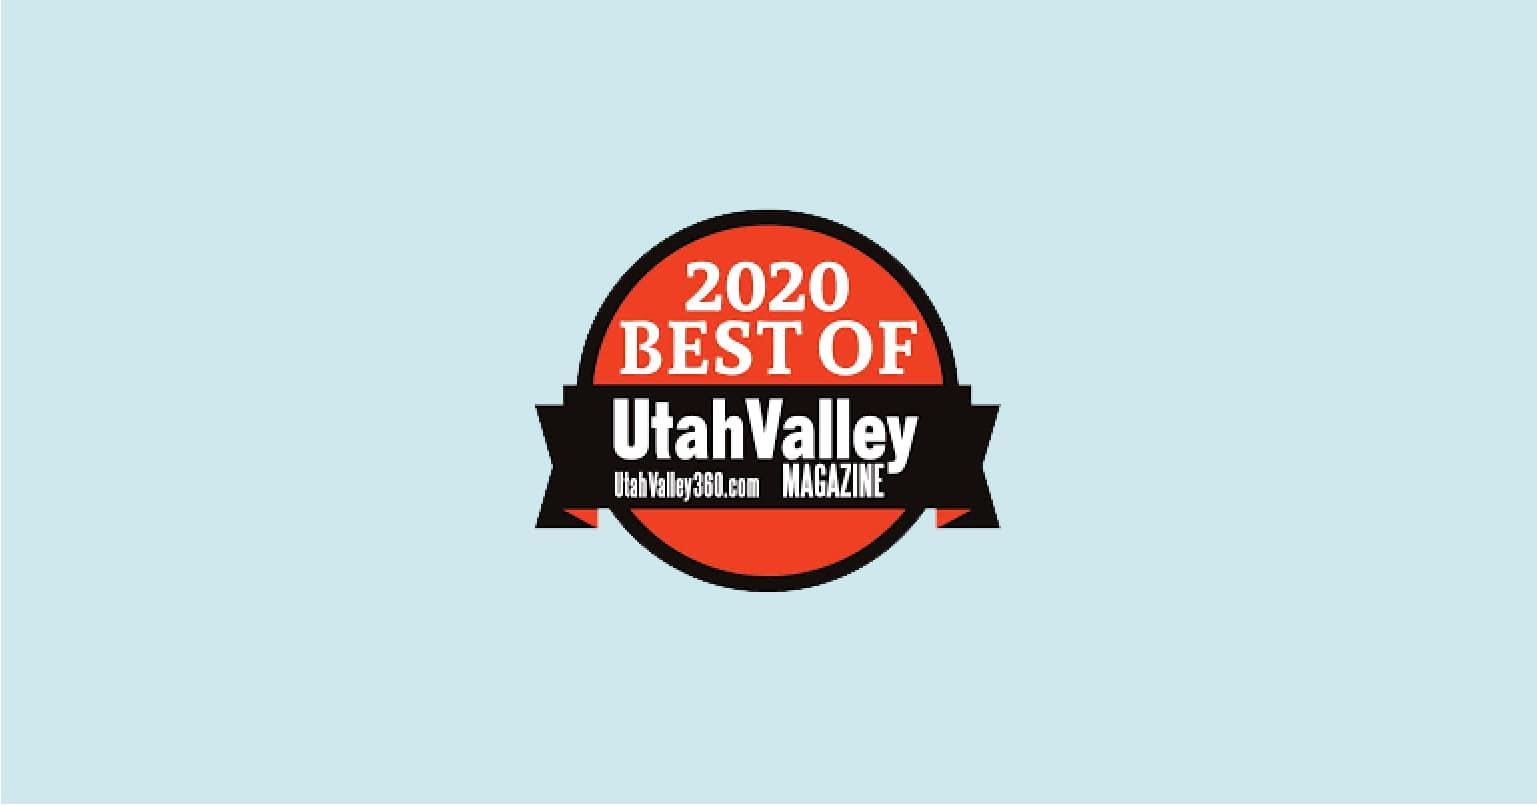 2020 Best of Utah Valley Payroll Service